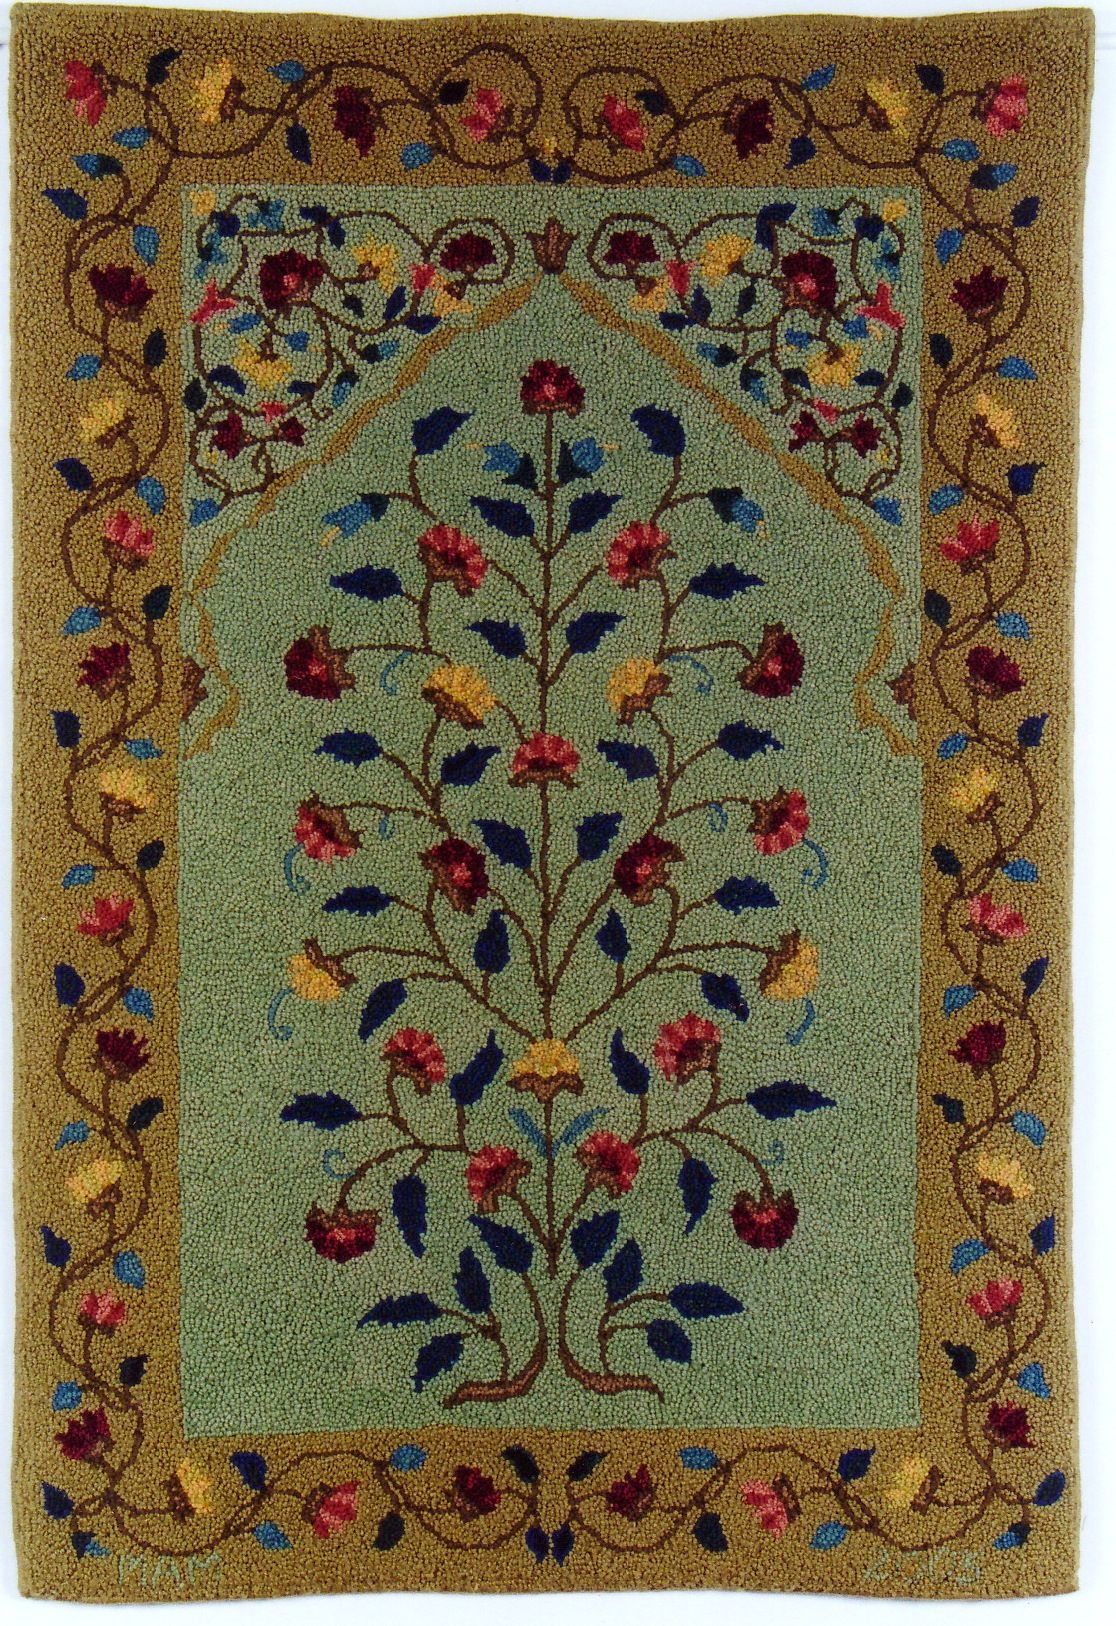 Persian prayer rug size